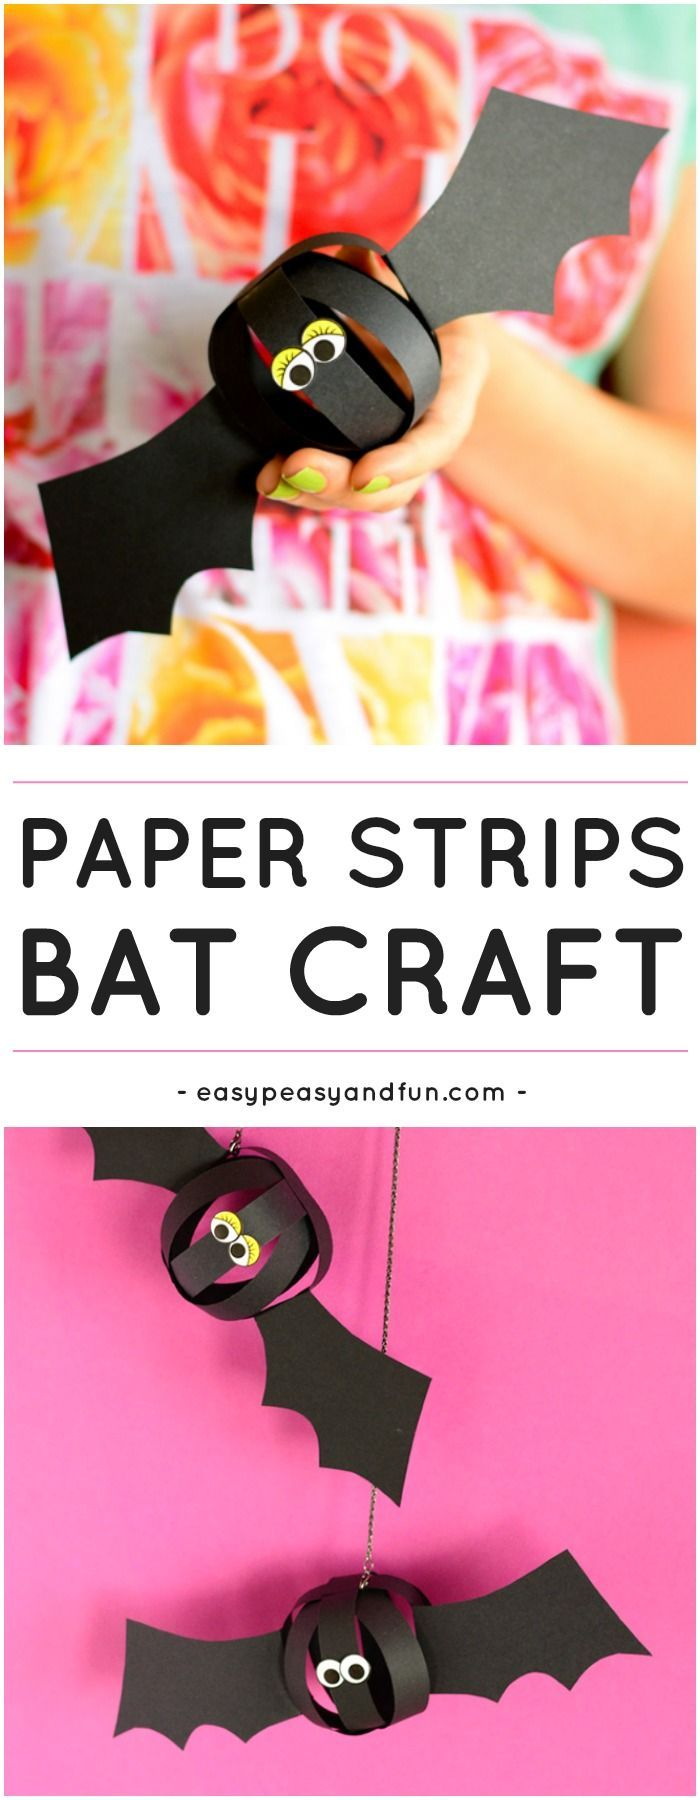 Paper Strips Bat Craft. Fun Paper Halloween Craft for Kids to Make.